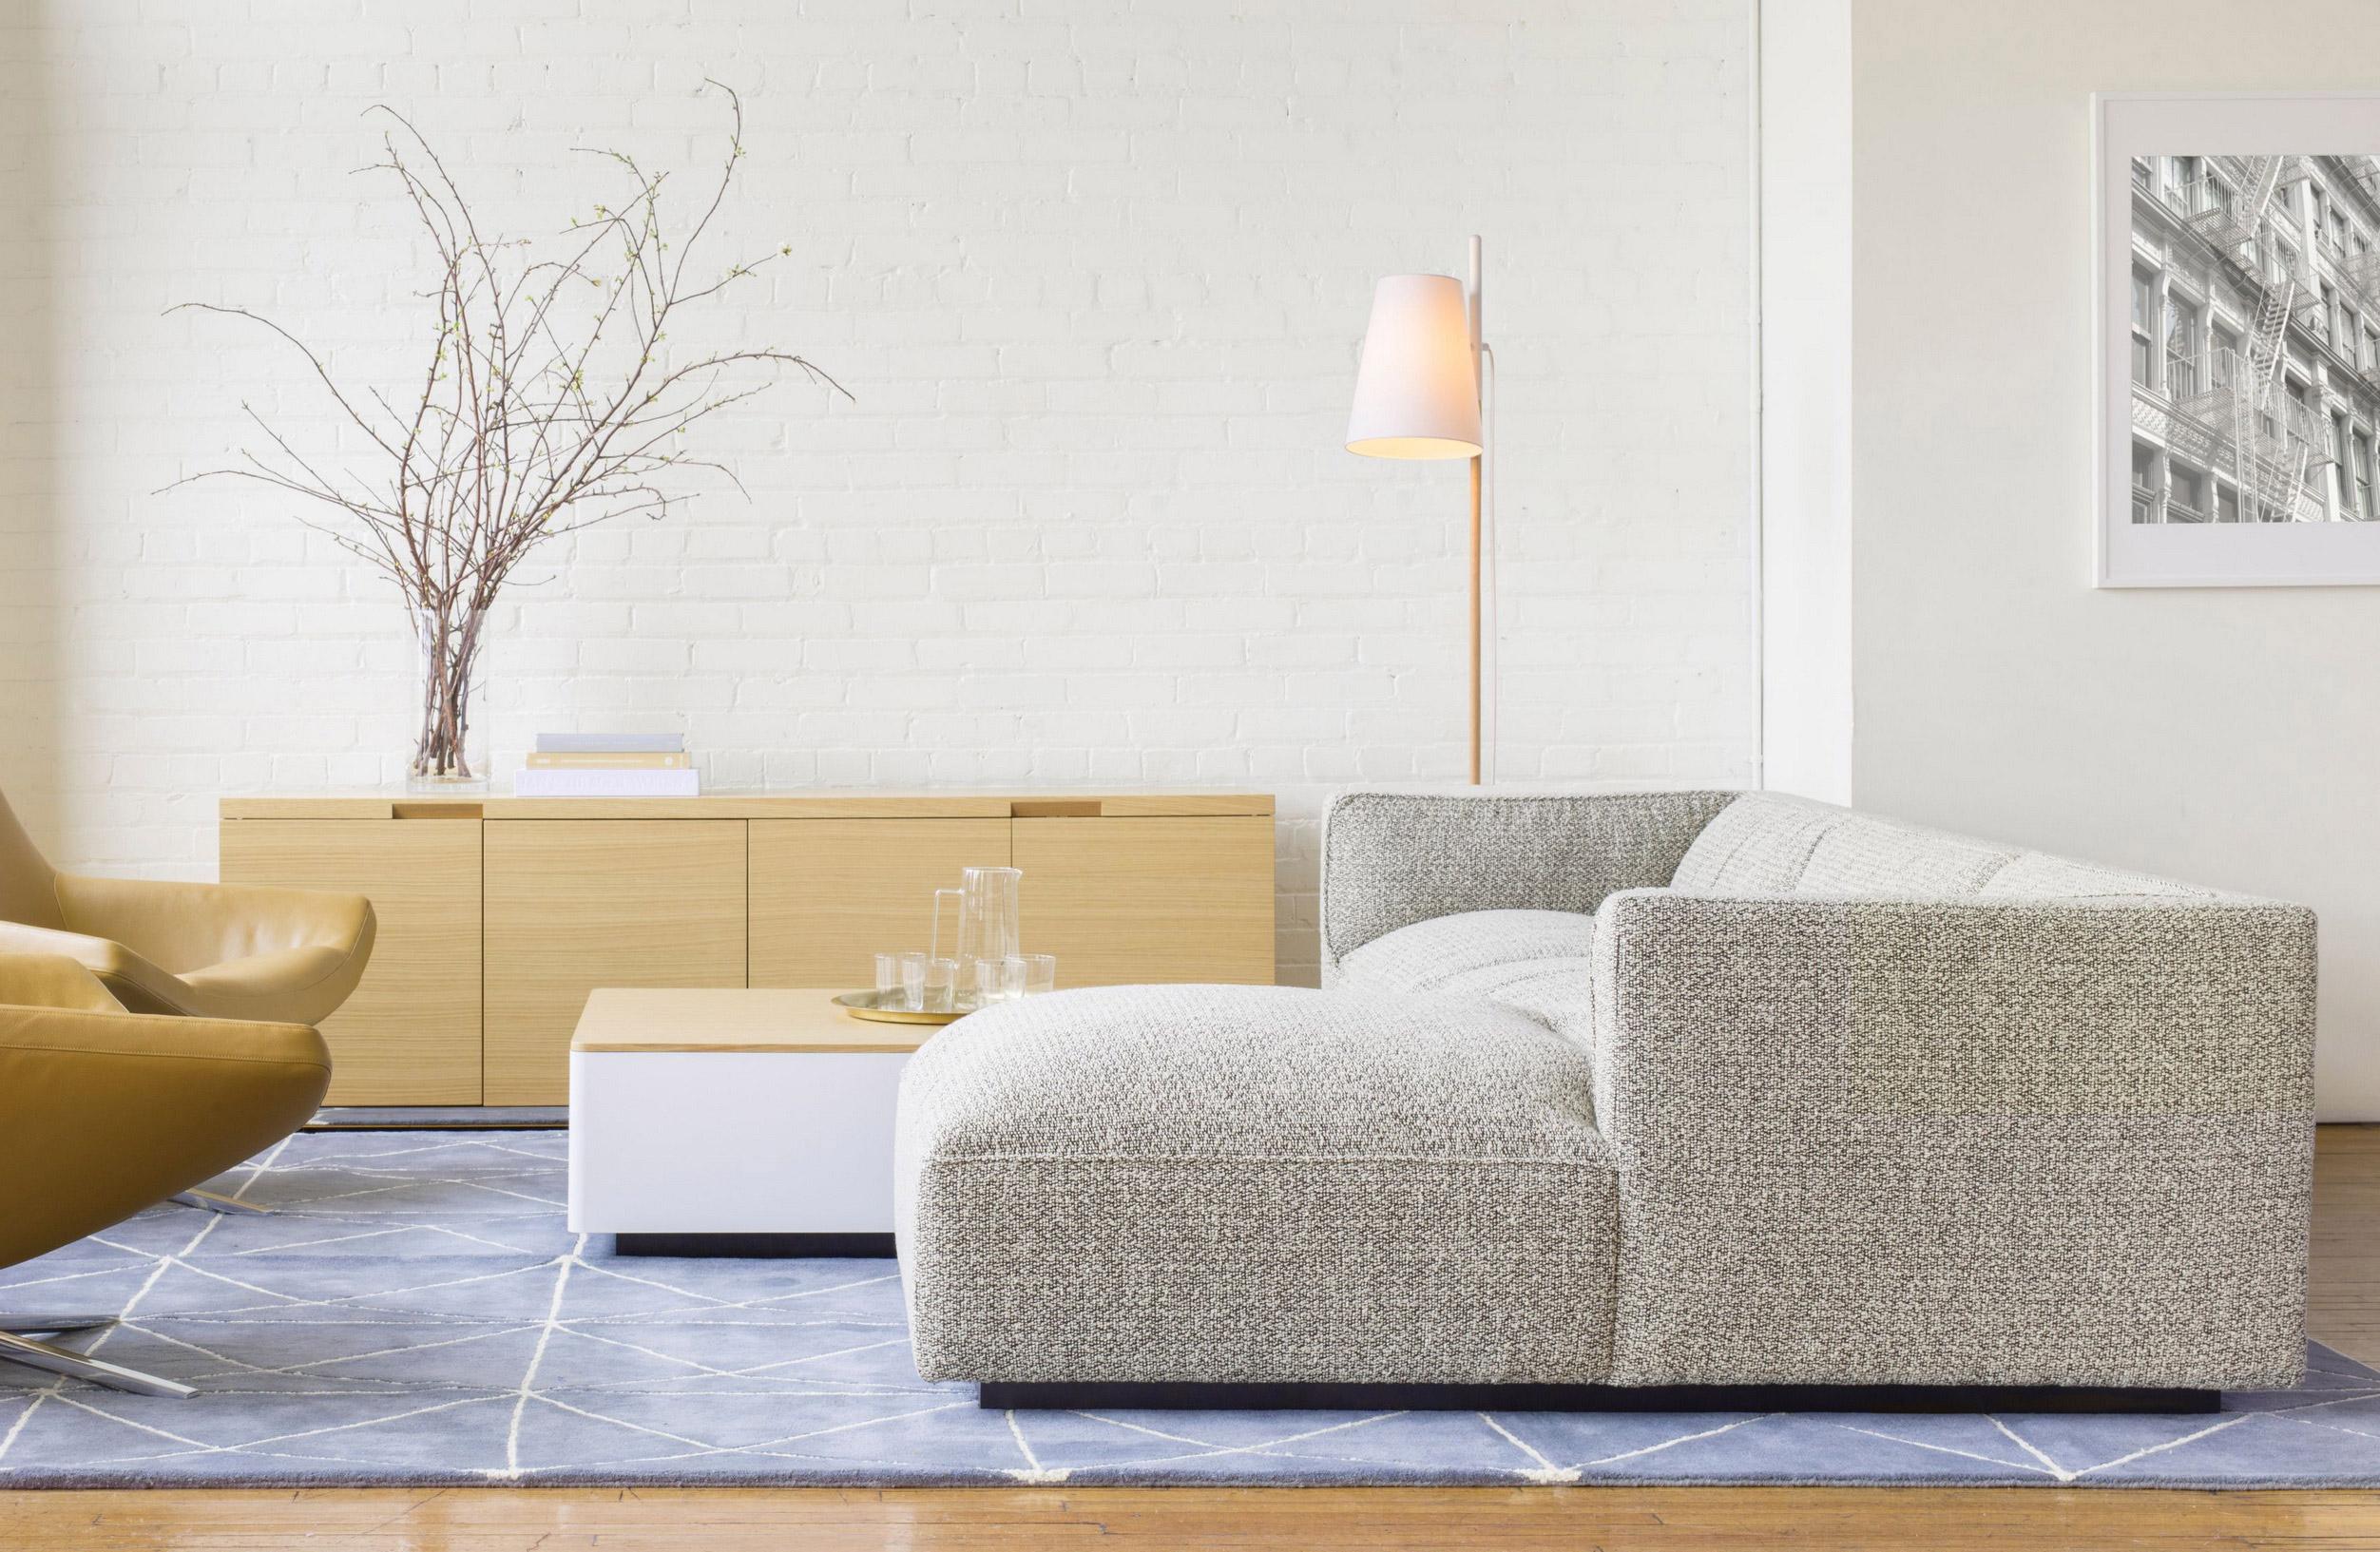 studio-tk_infinito-lounge-03